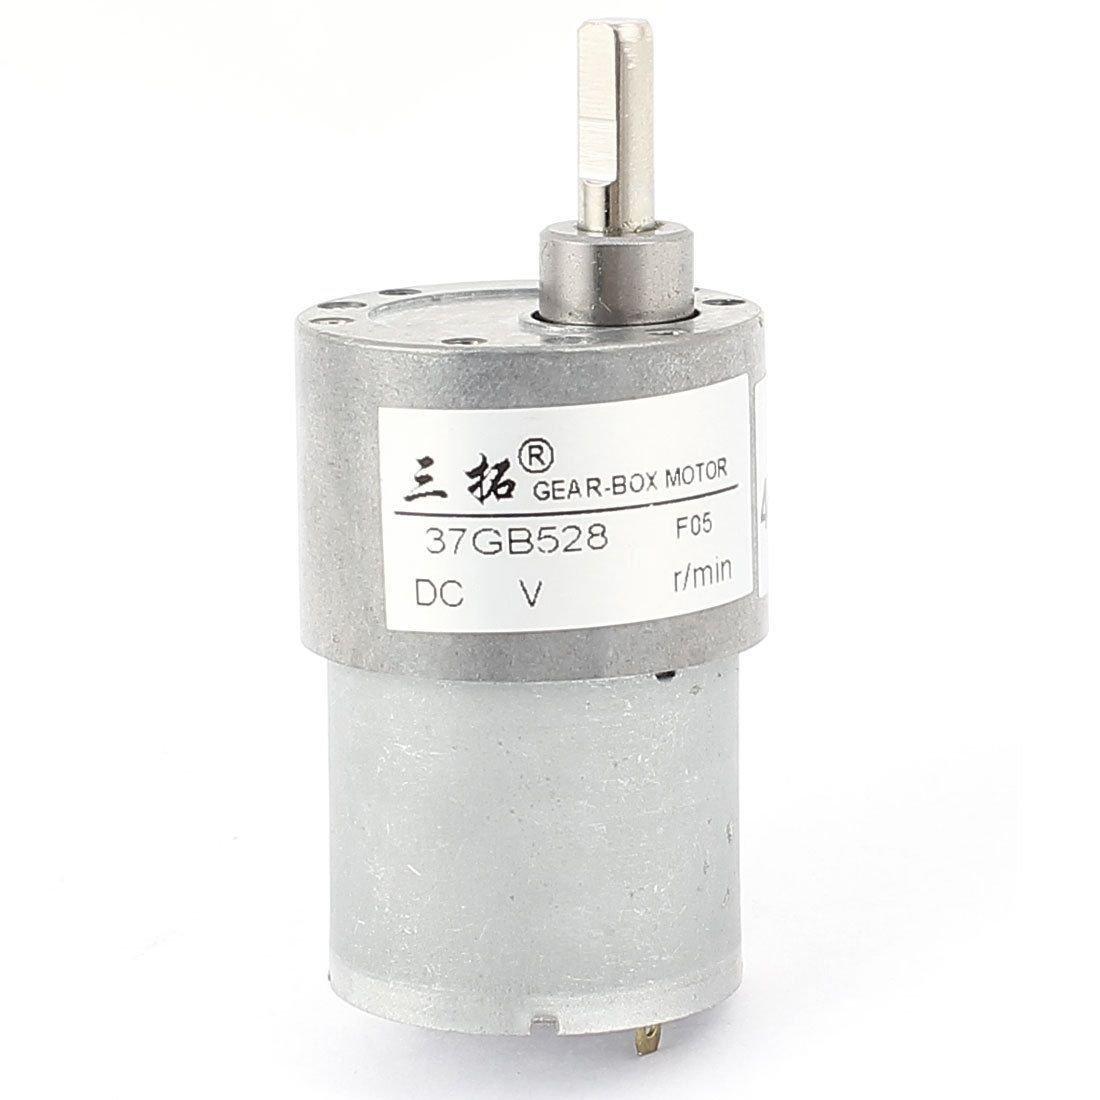 DC 24V 10RPM 0.15A 10KG.cm High Torque DC Gear Box Reducer Variable Speed Motor